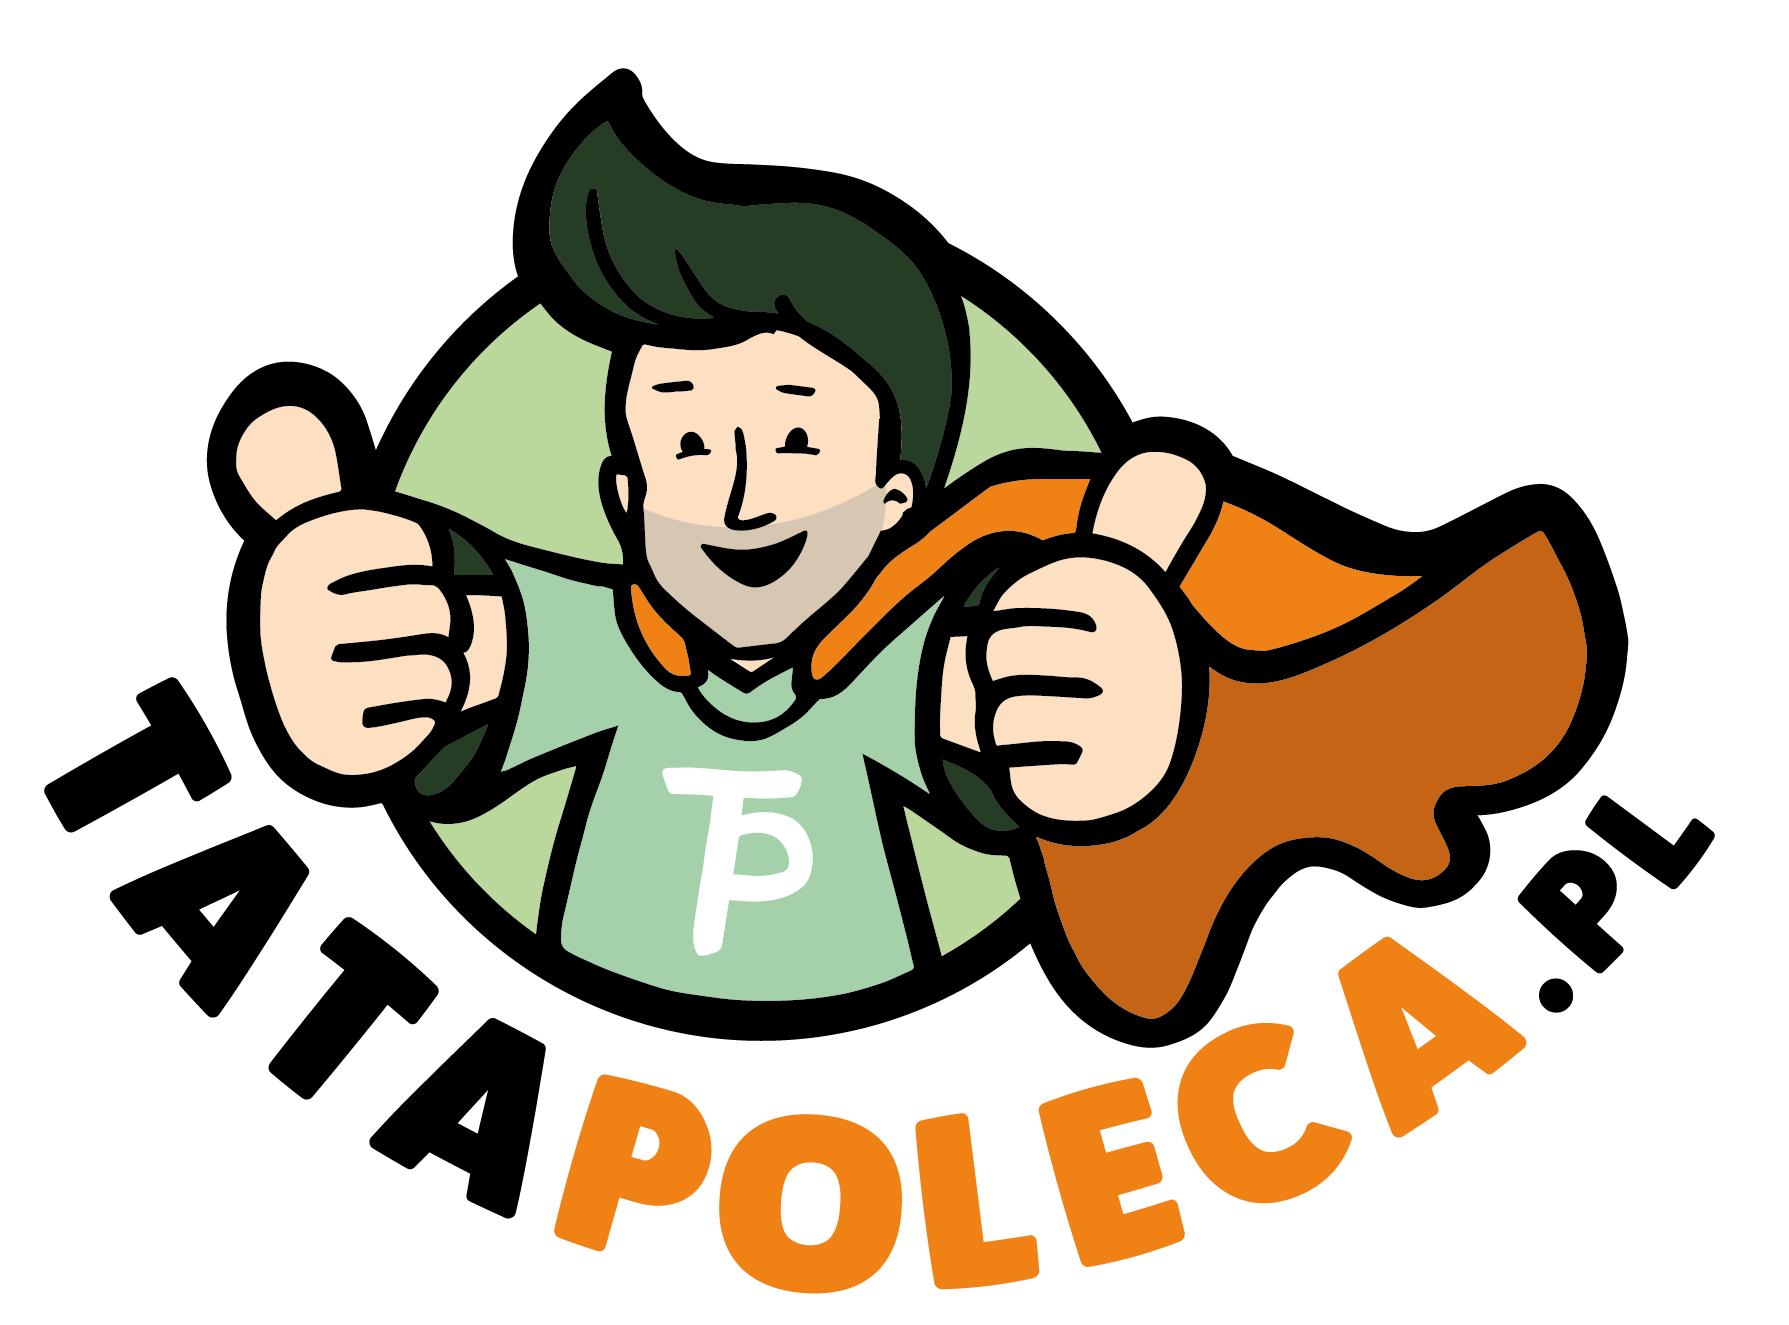 TATApoleca.pl